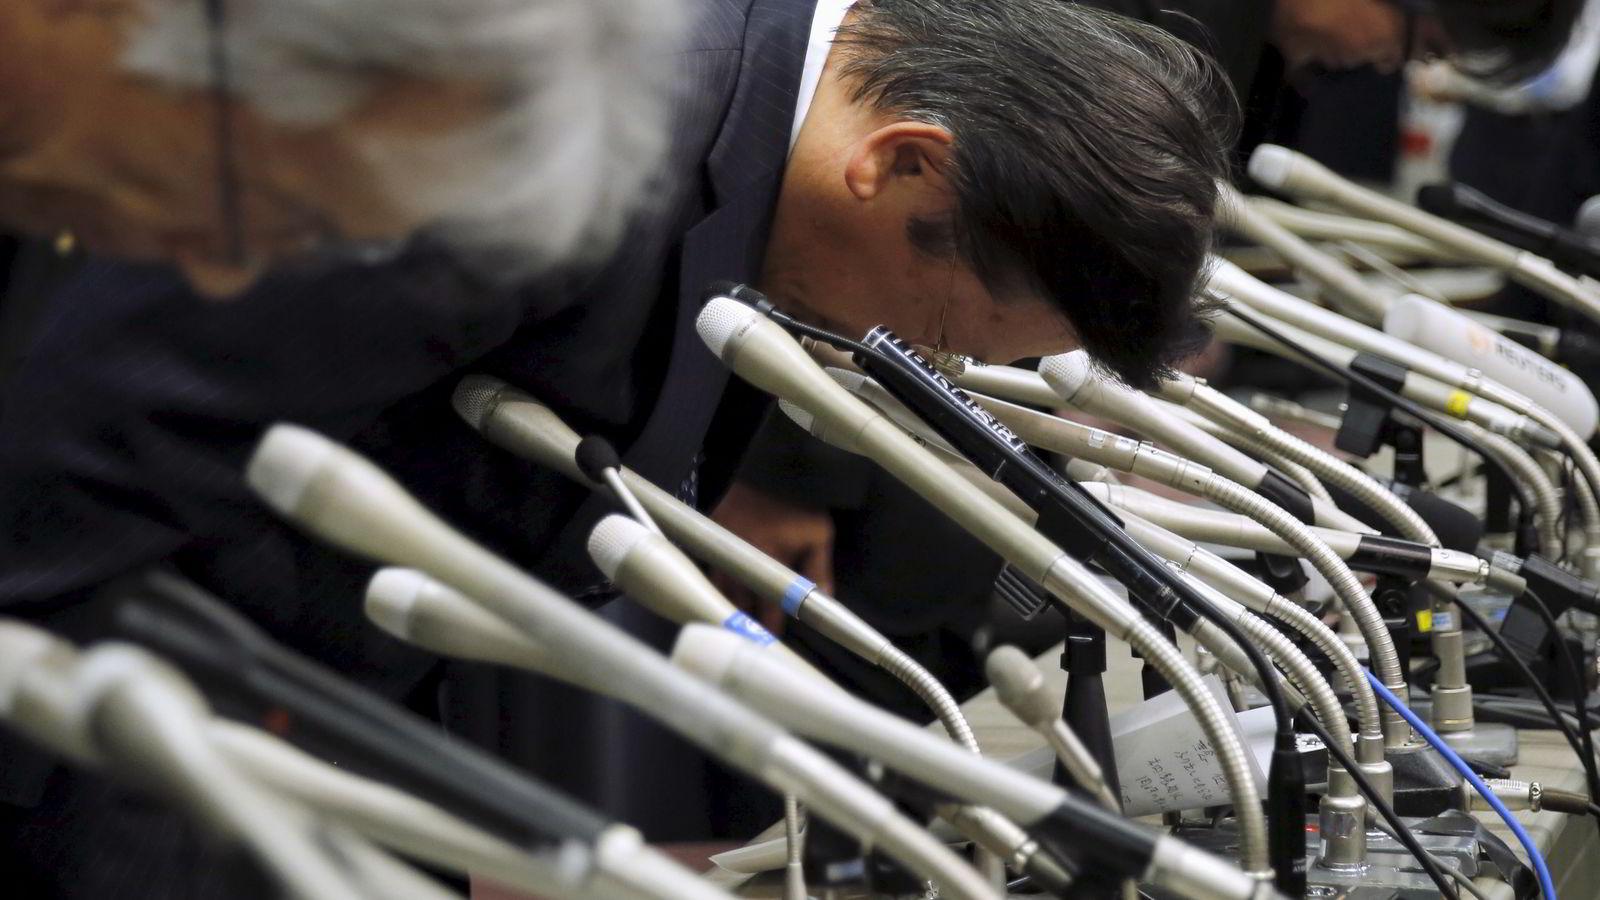 Mitsubishi-sjef Tetsuro Aikaw (midten) bukker dypt sammen med øvrige i toppledelsen på en pressekonferanse i Tokyo onsdag. Foto: Toru Hanai/